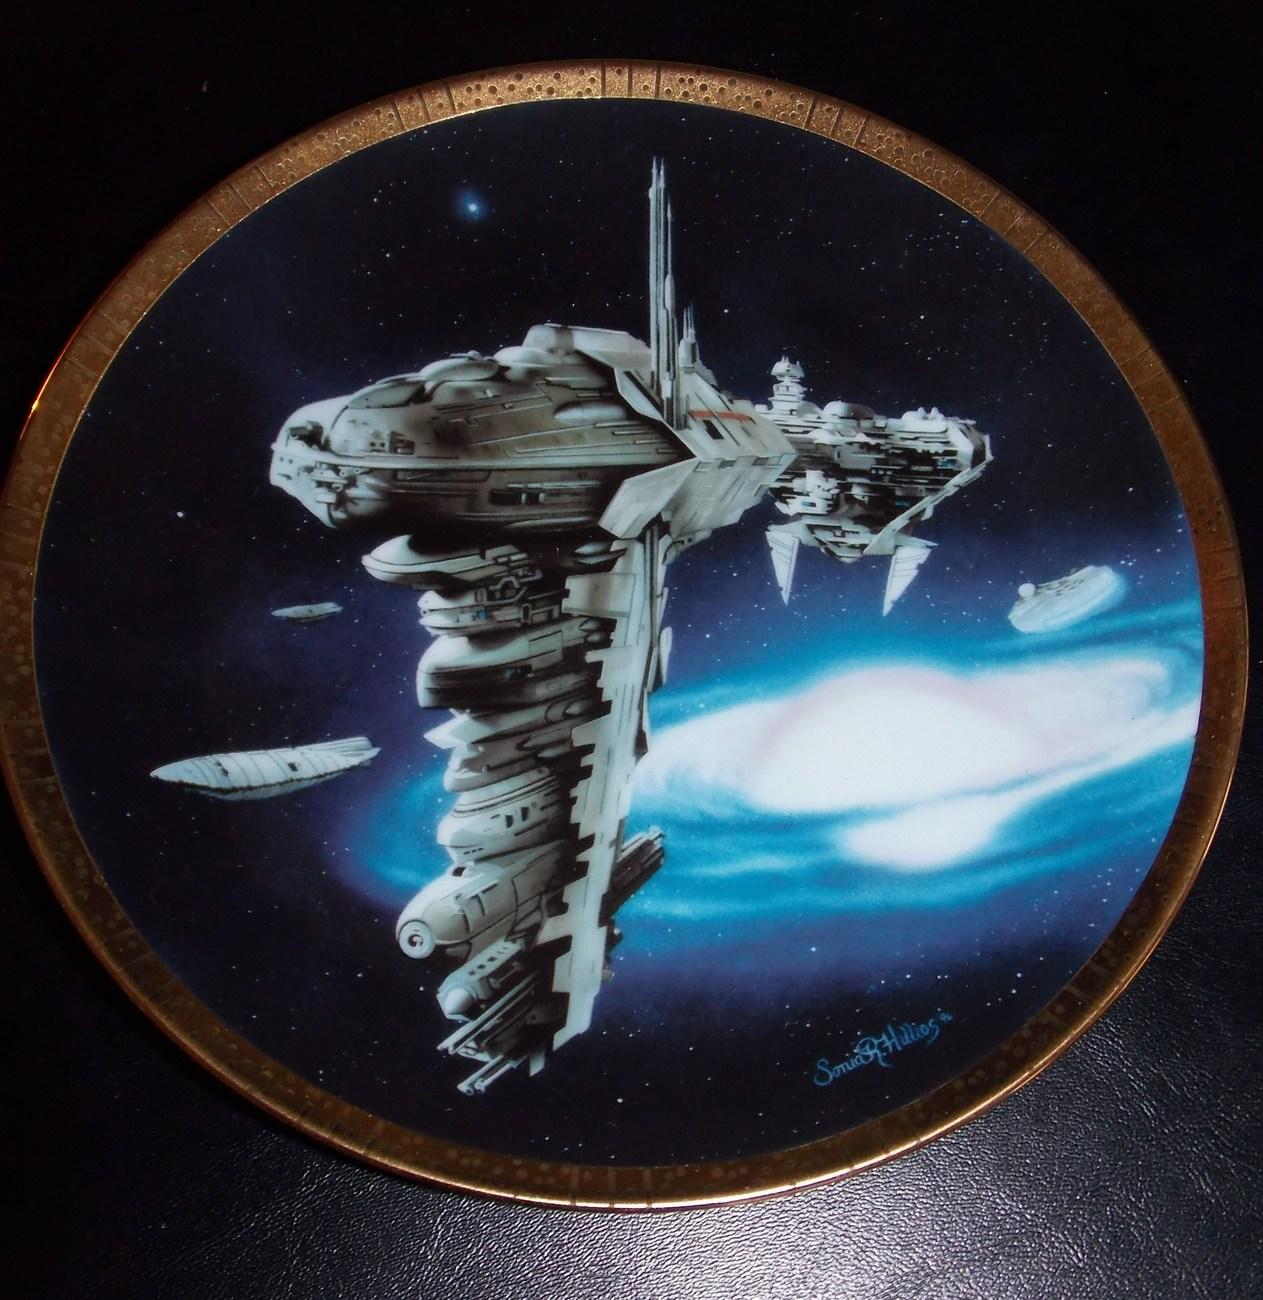 Star wars plates 007